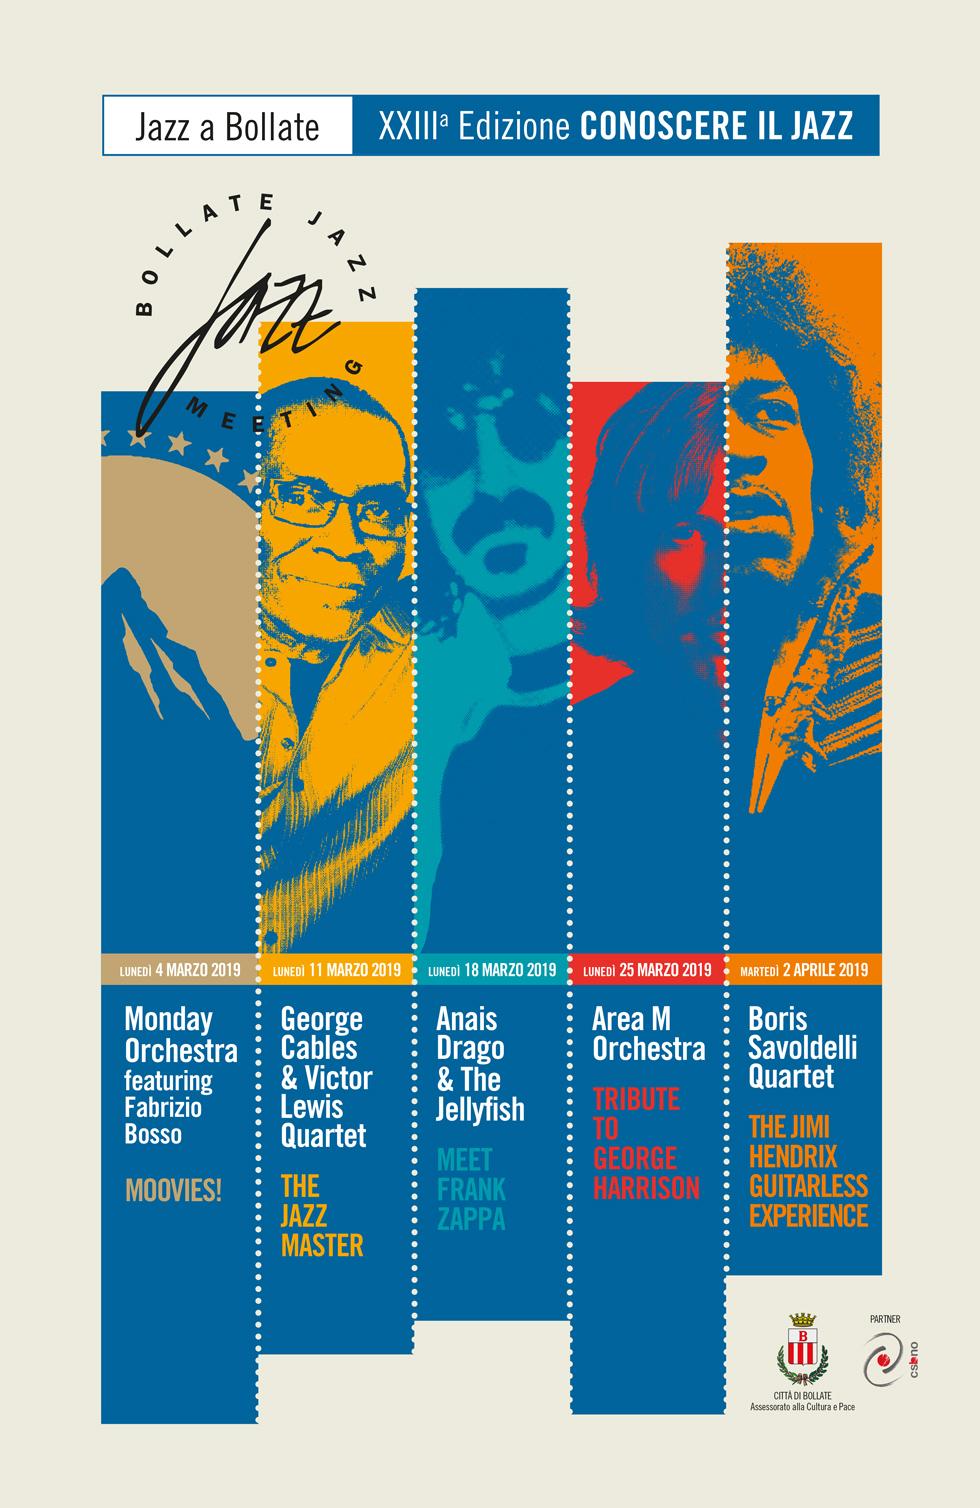 Bollate-Jazz-meeting-XXIII-2019_banner_CON-ZAPPA